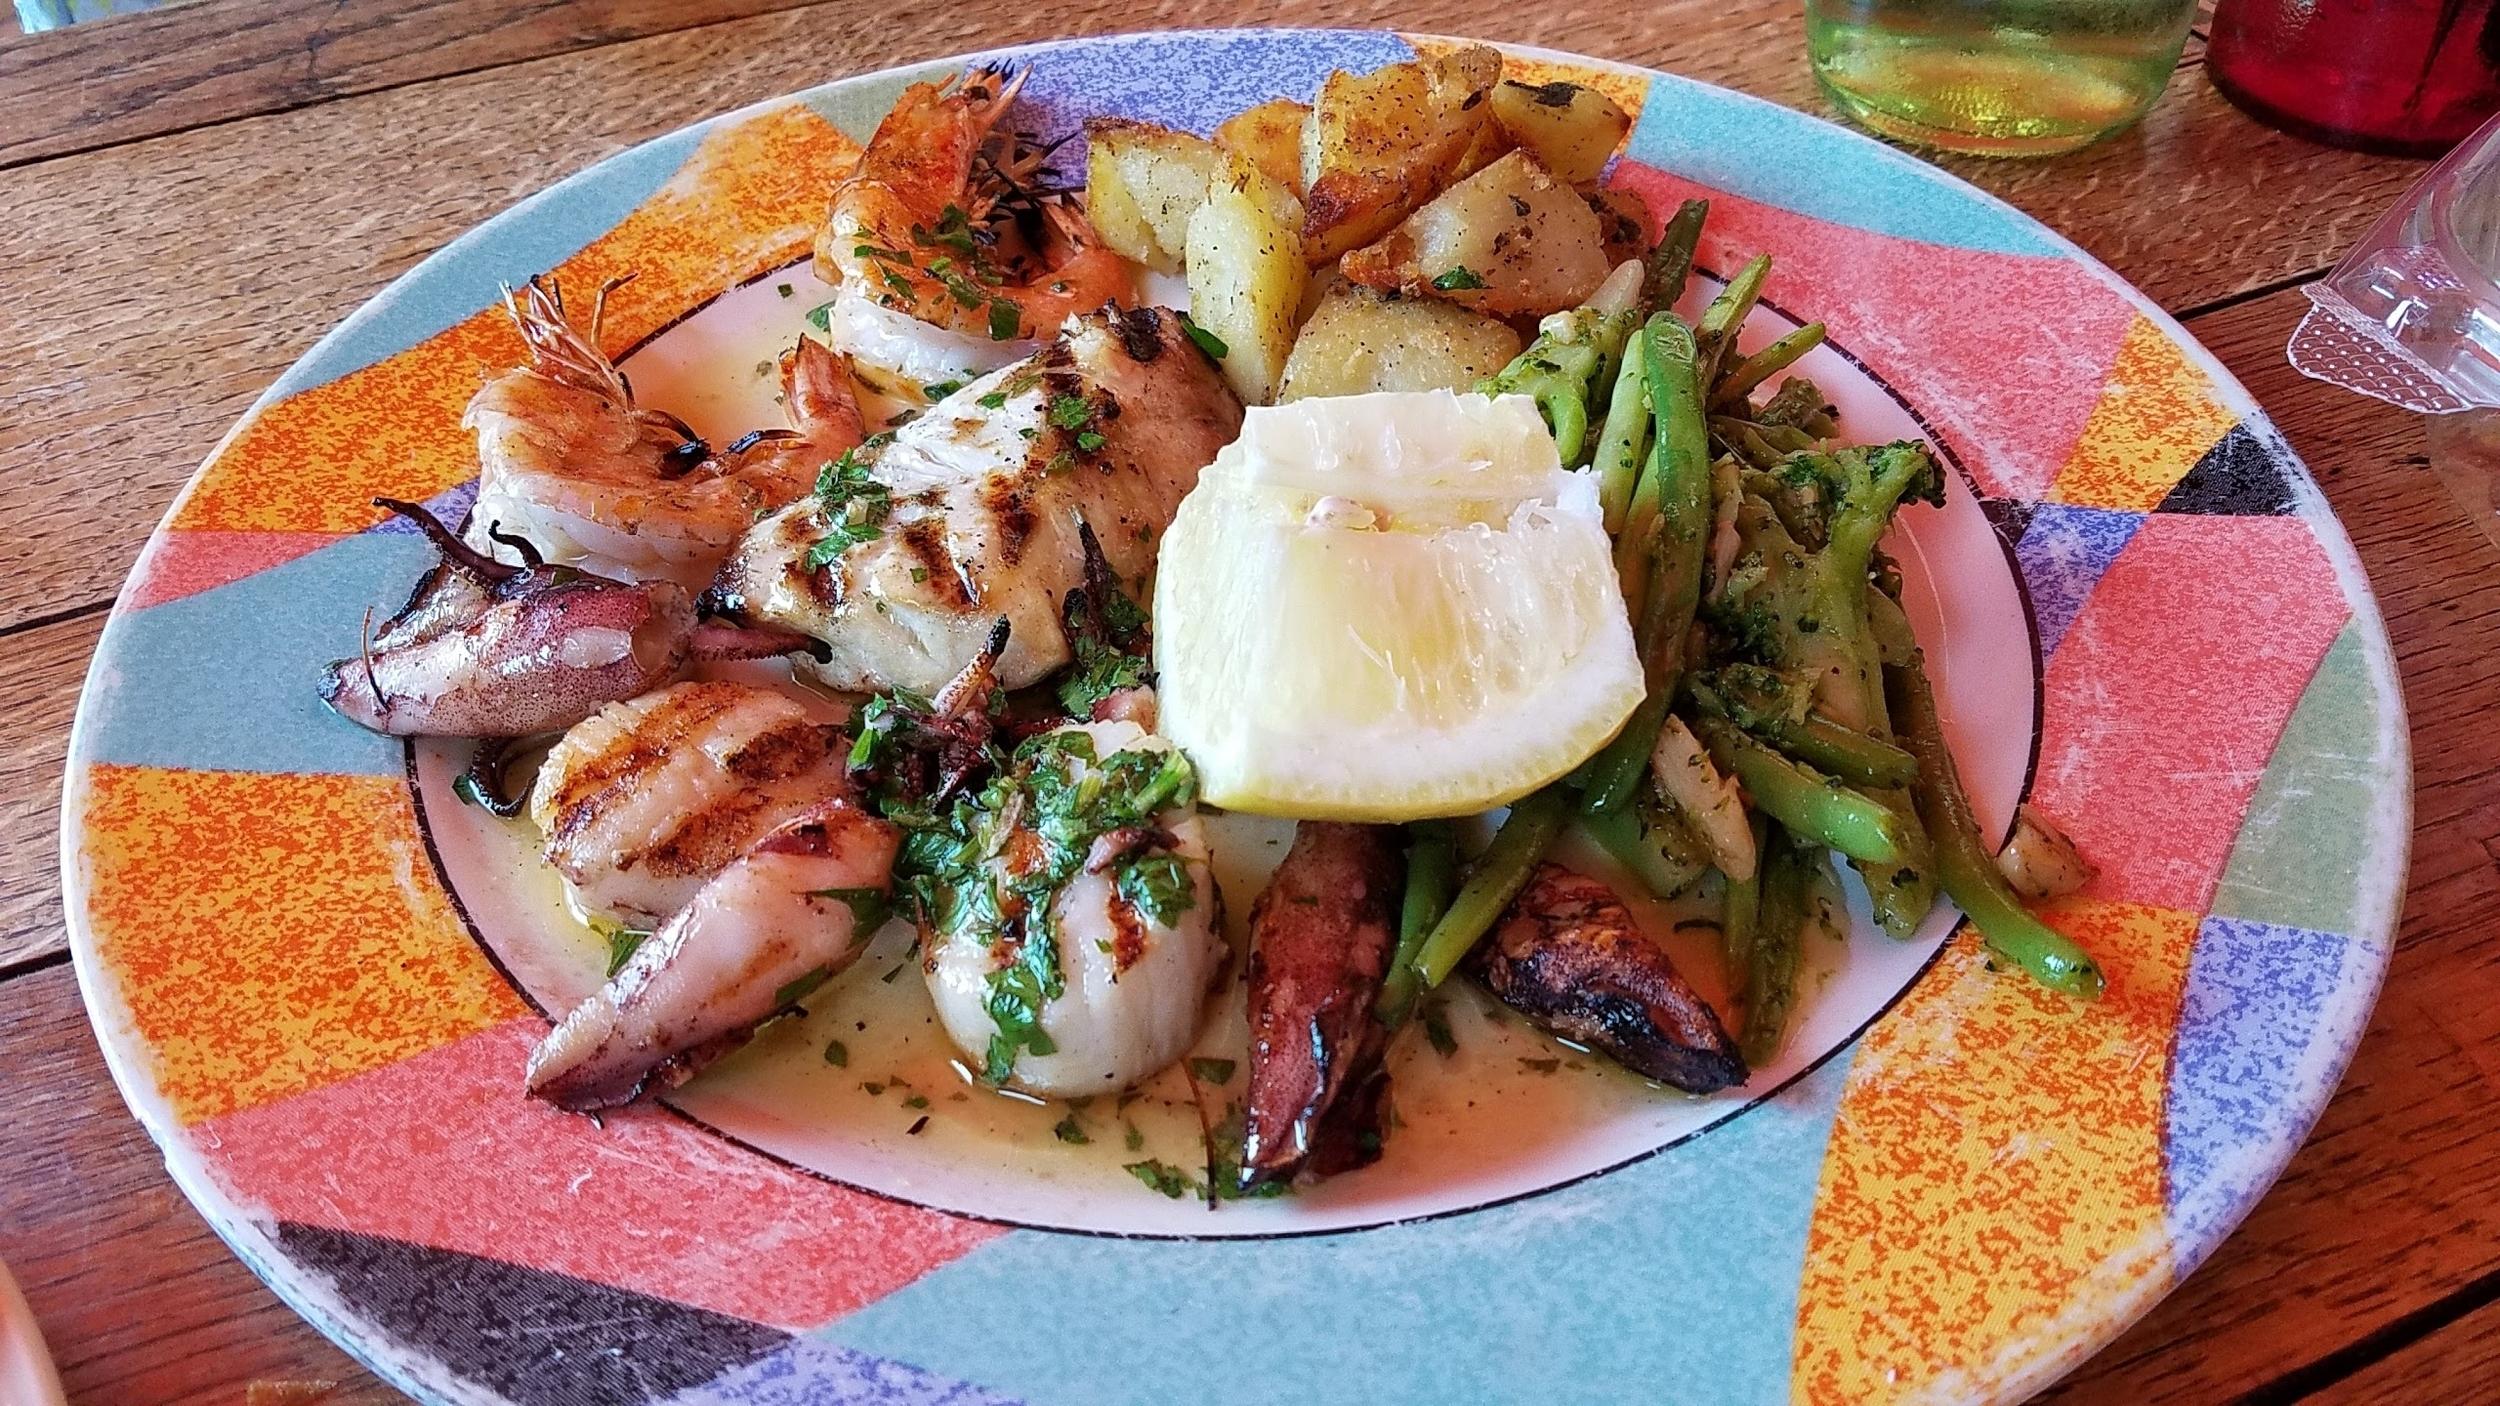 Pesce Misto special (grilled scallops, shrimp, calamari, and sea bass)